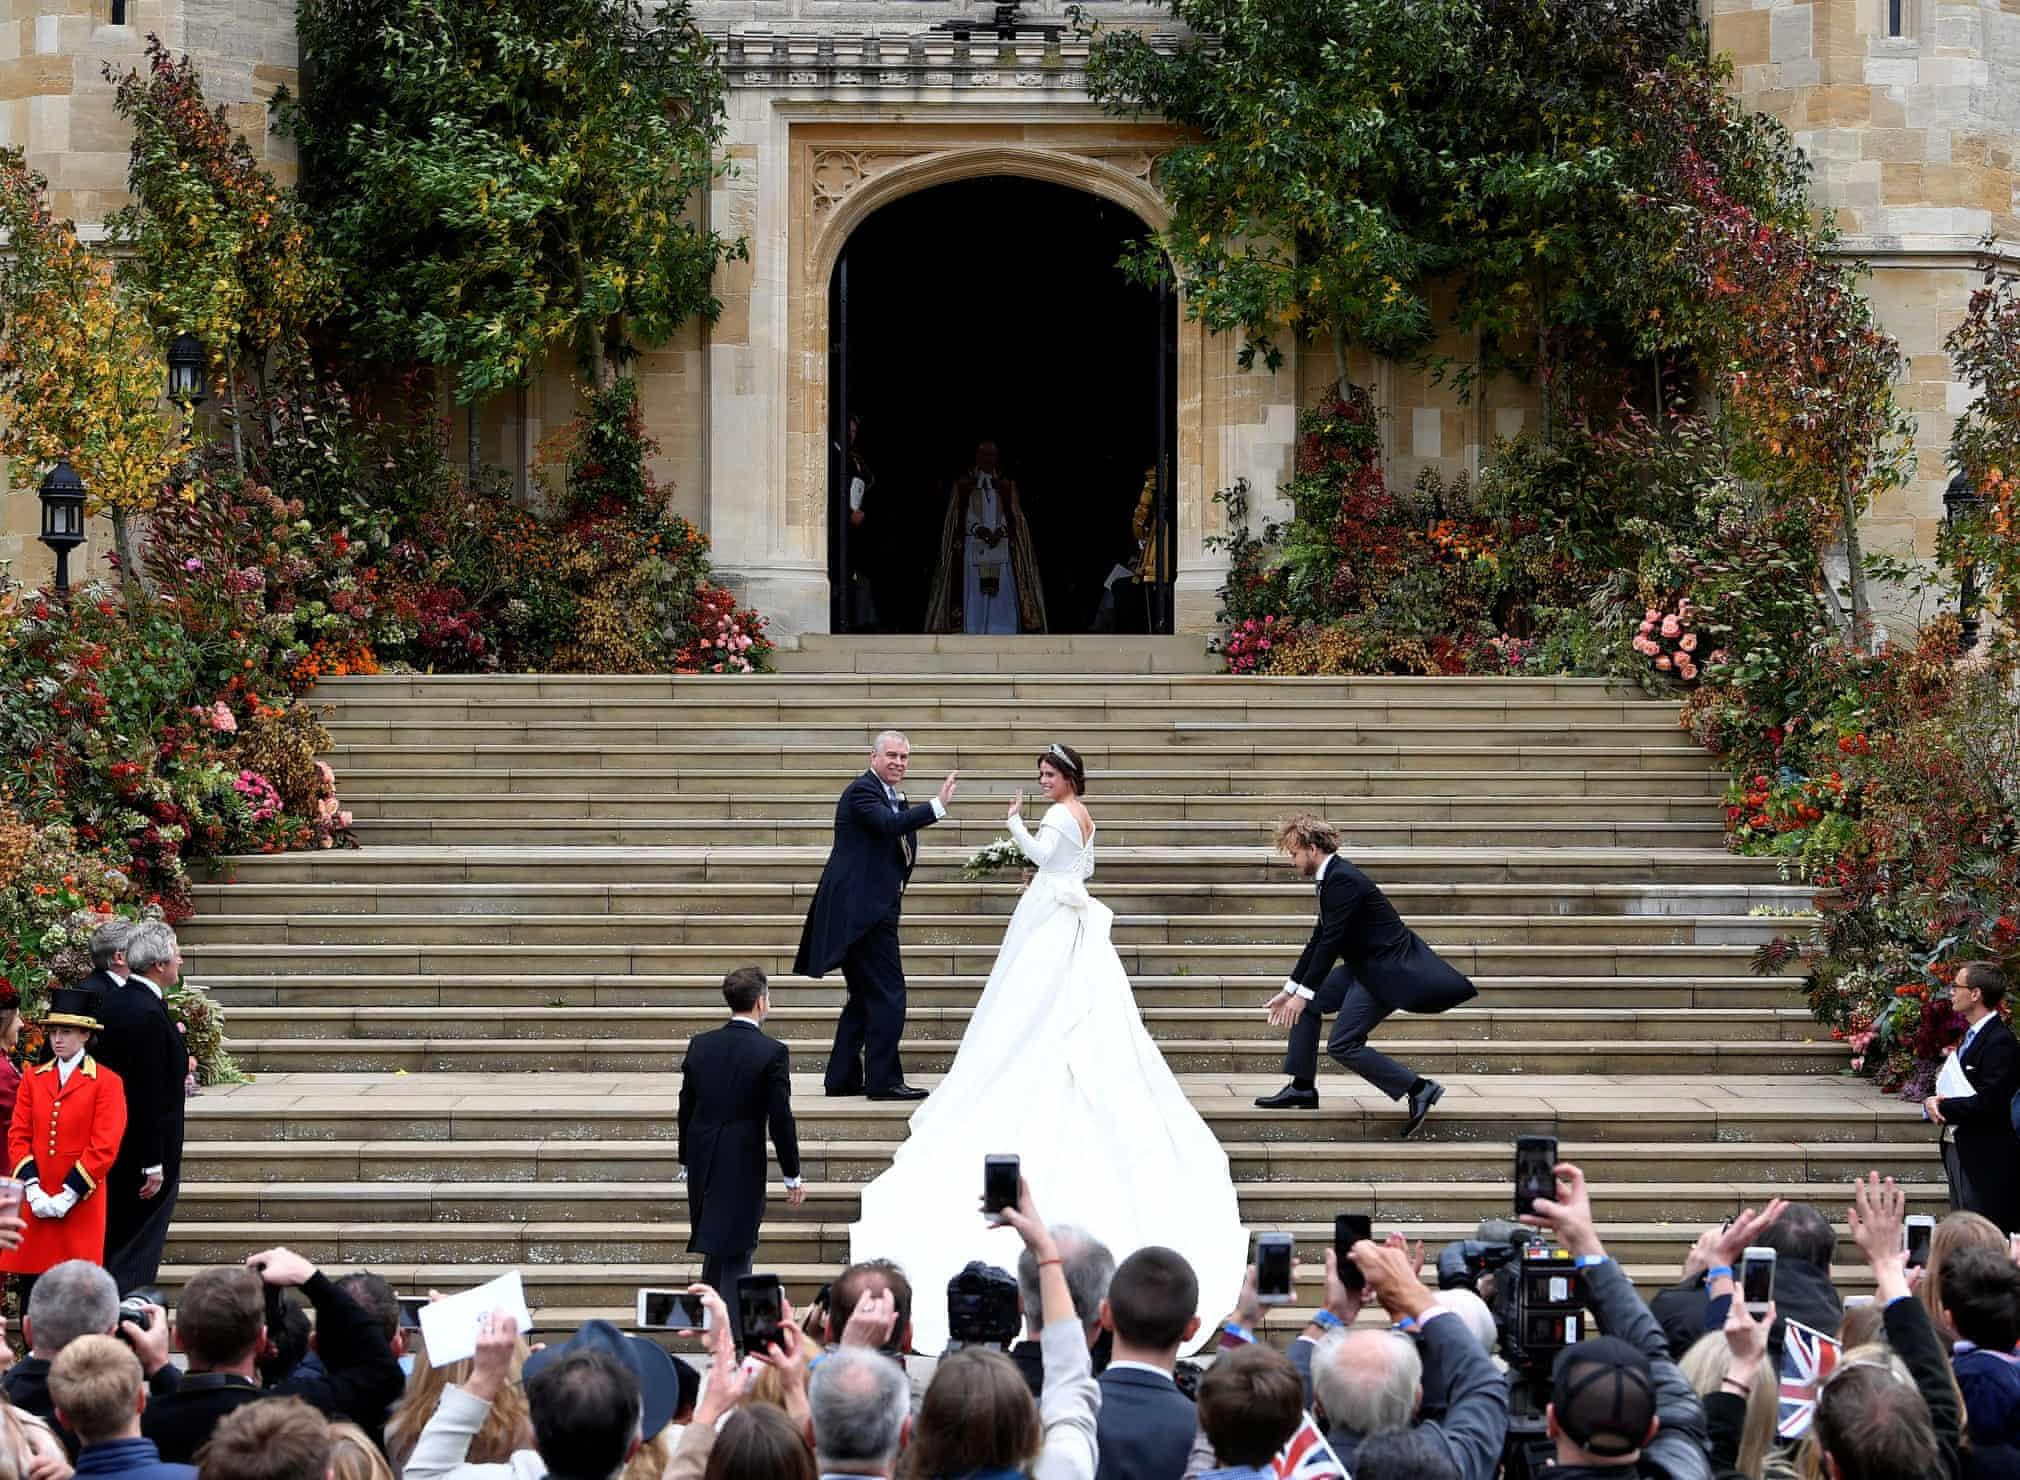 Royal Wedding of Princess Eugenie